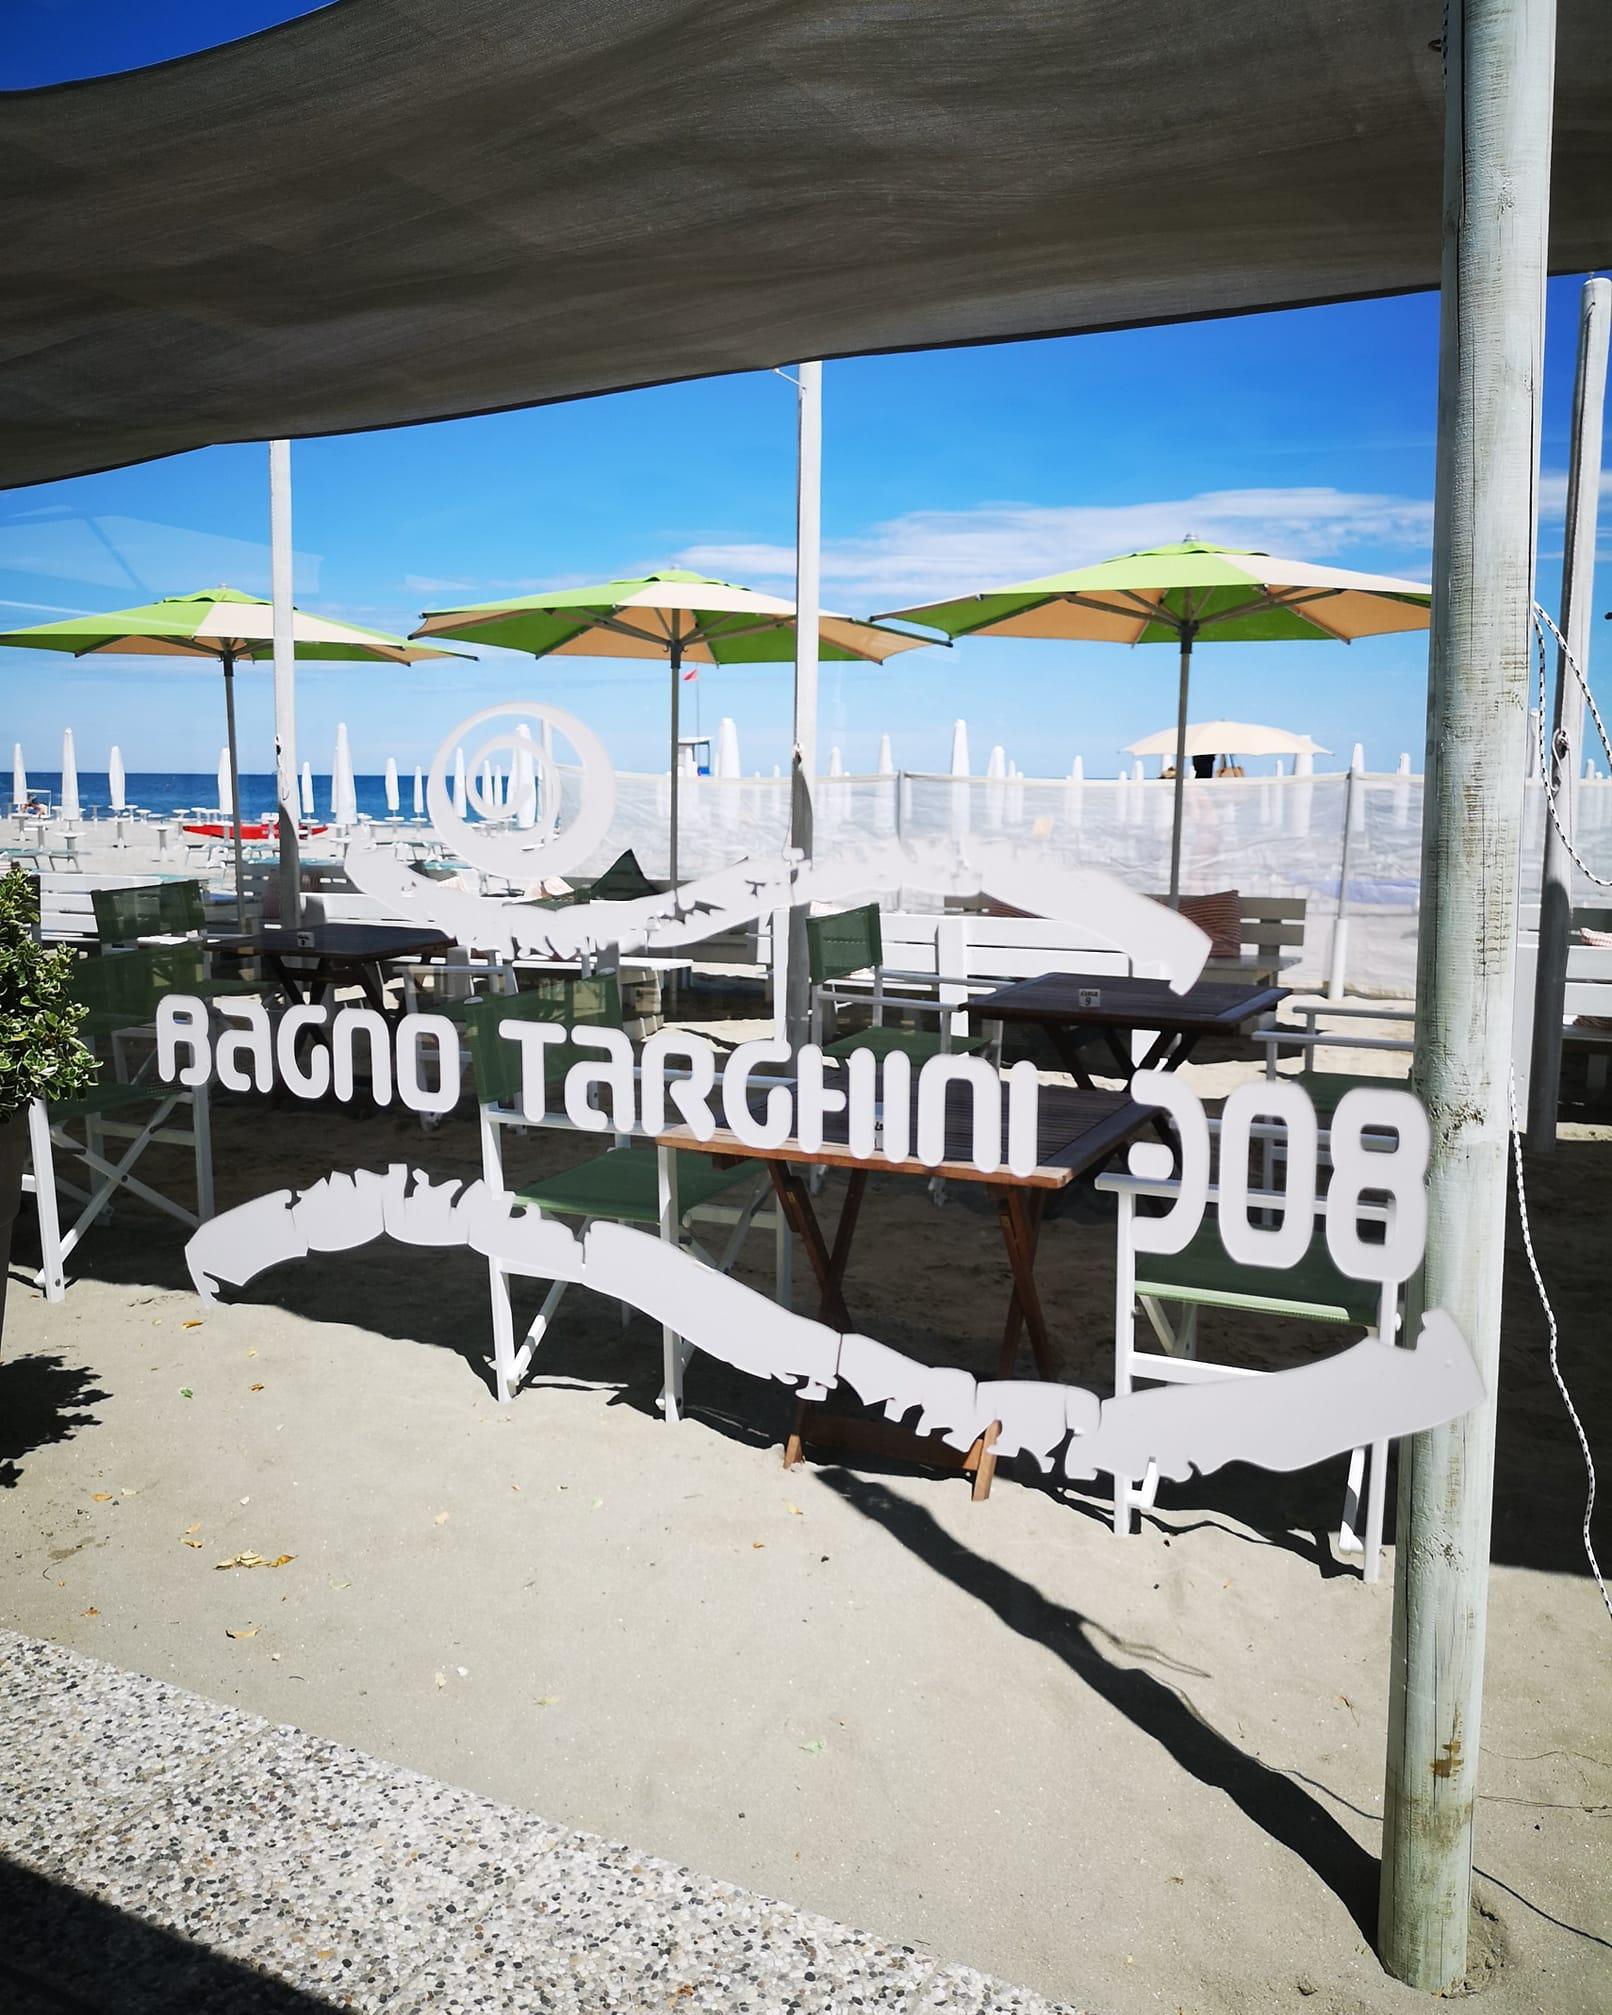 Bagno Targhini 308